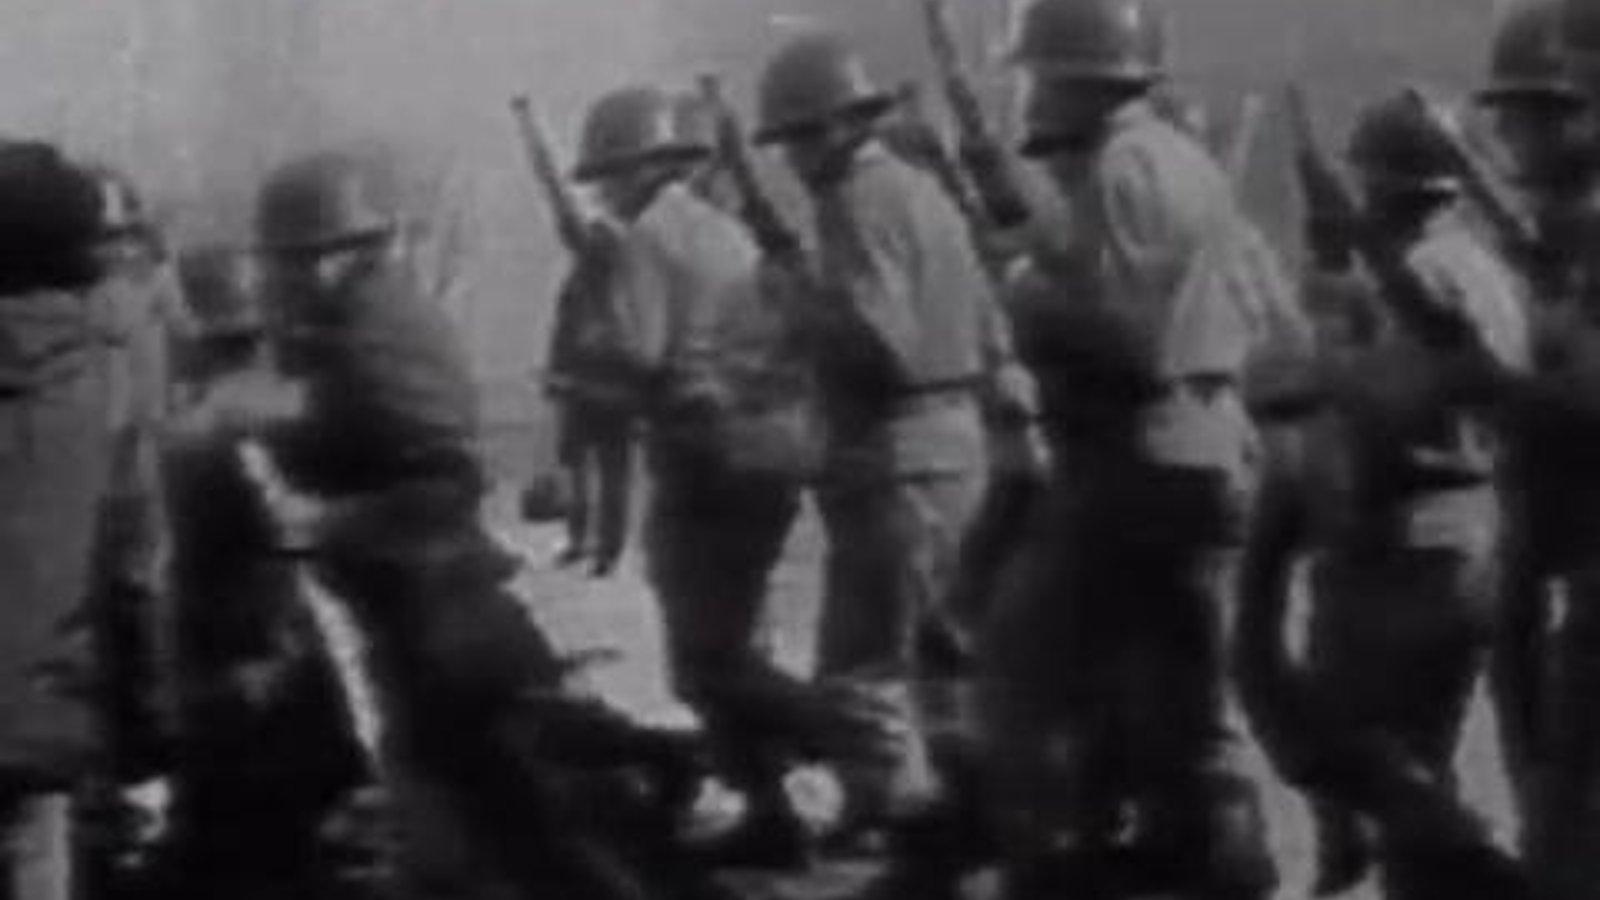 Salvador Allende: Coup D'etat In Santiago